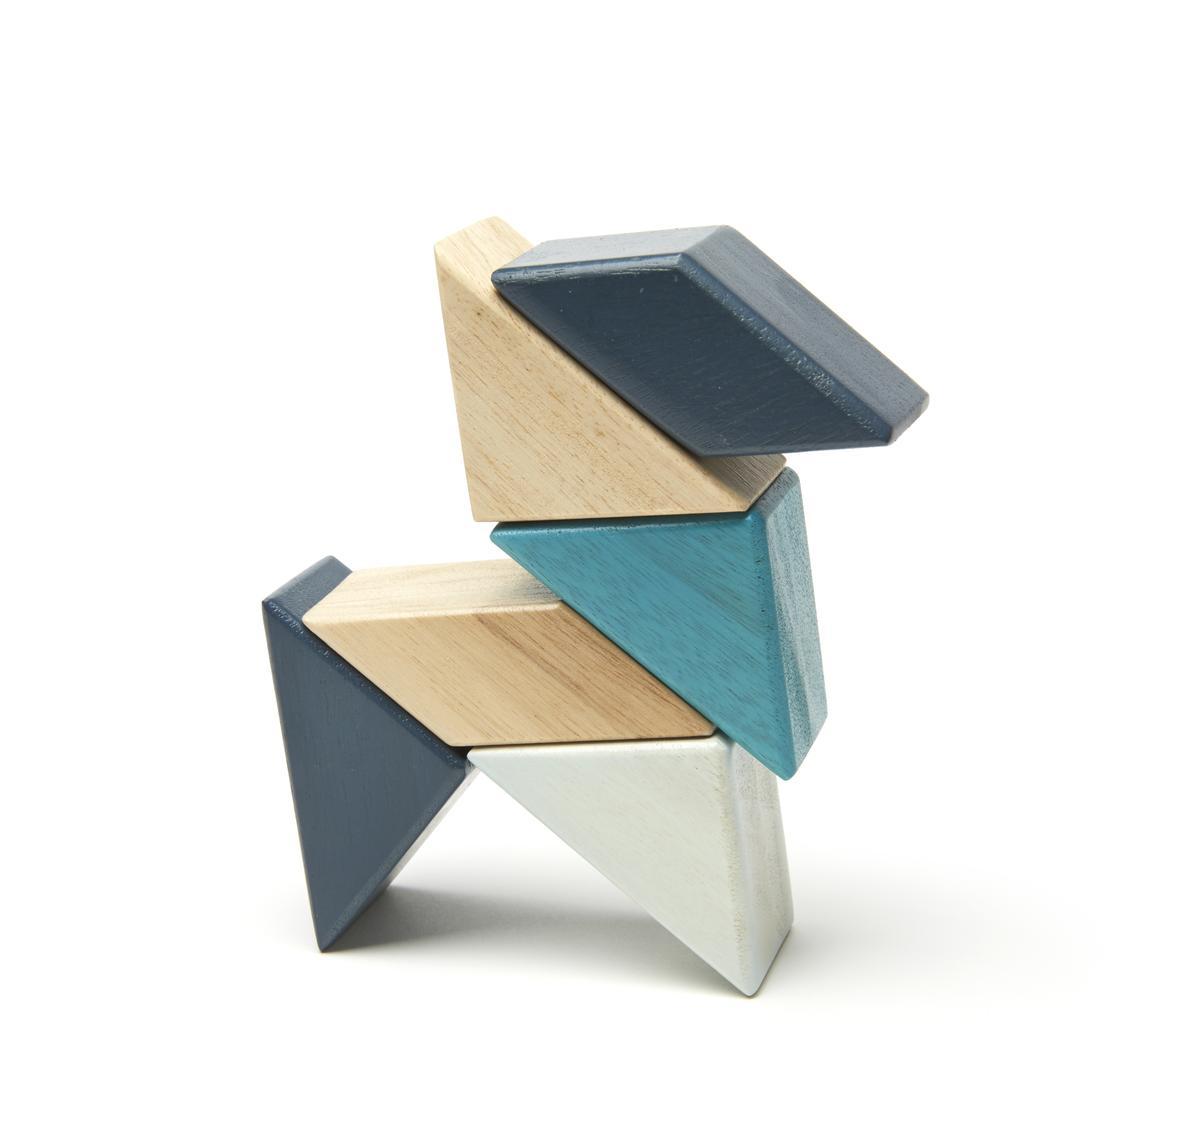 Tegu Prism Pocket Pouch Blues - Κατασκευή Goat